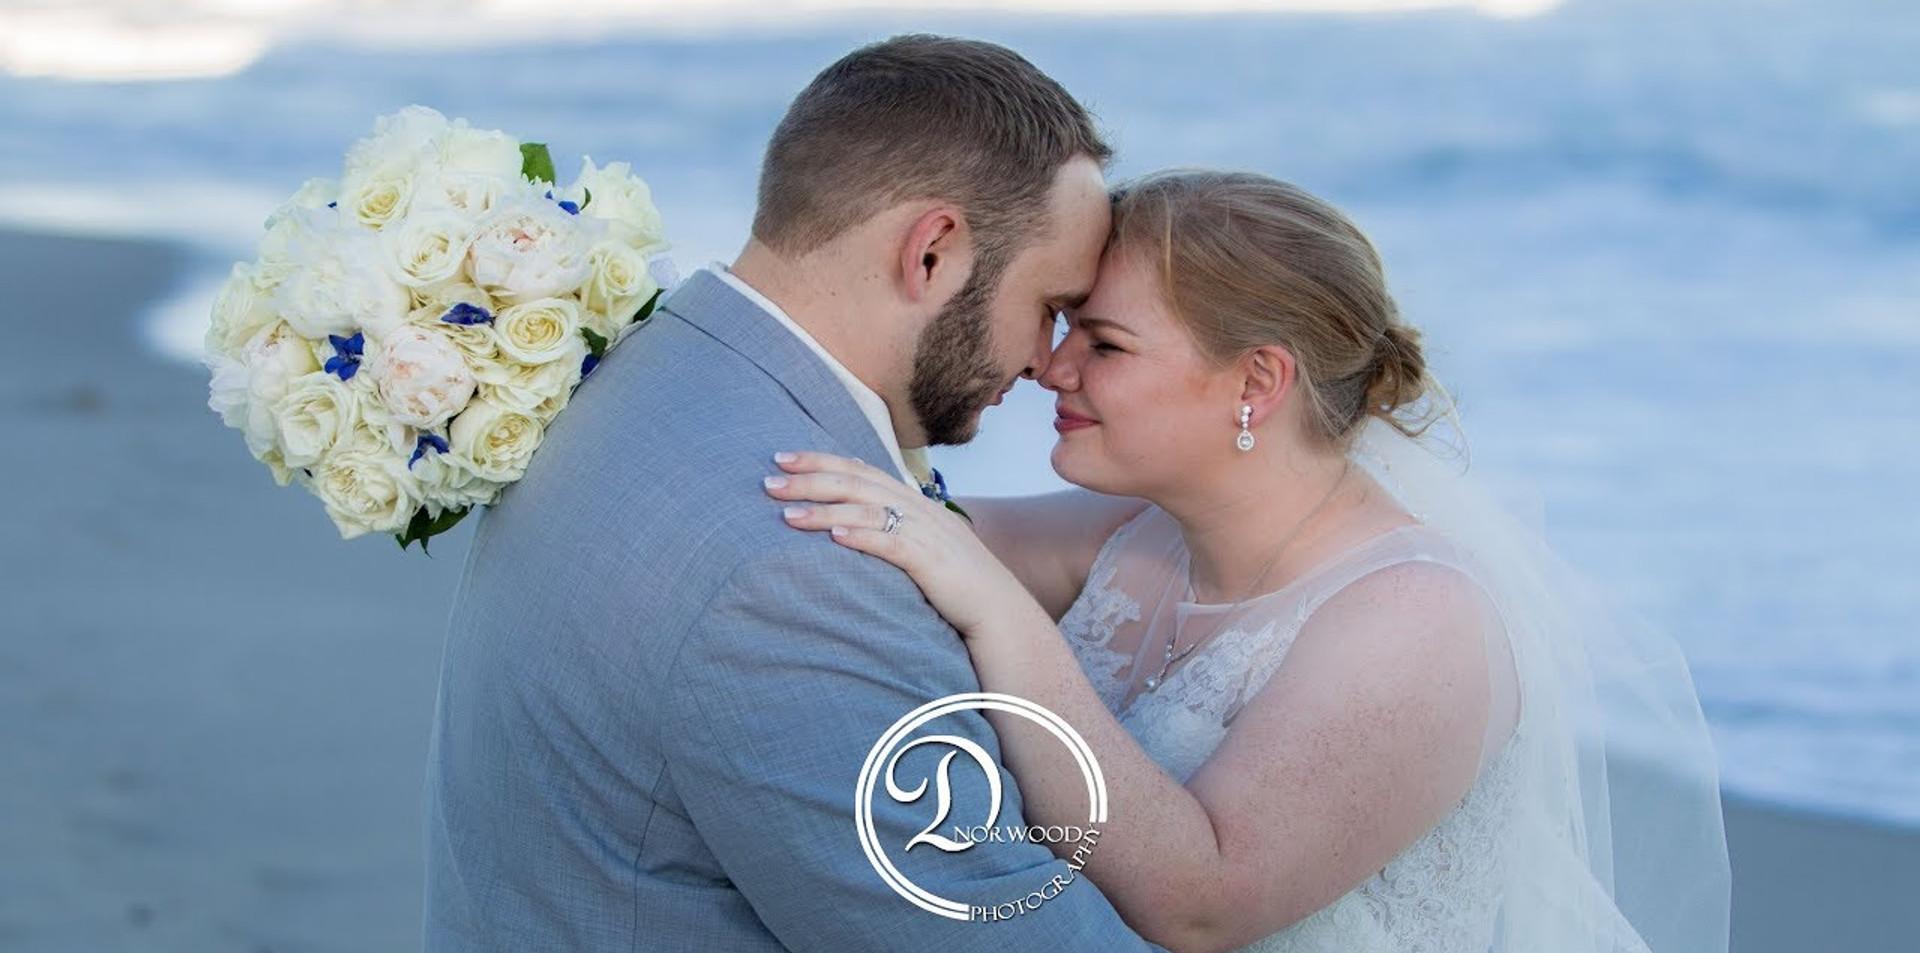 The Martino Wedding | Raddison Melbourne, FL